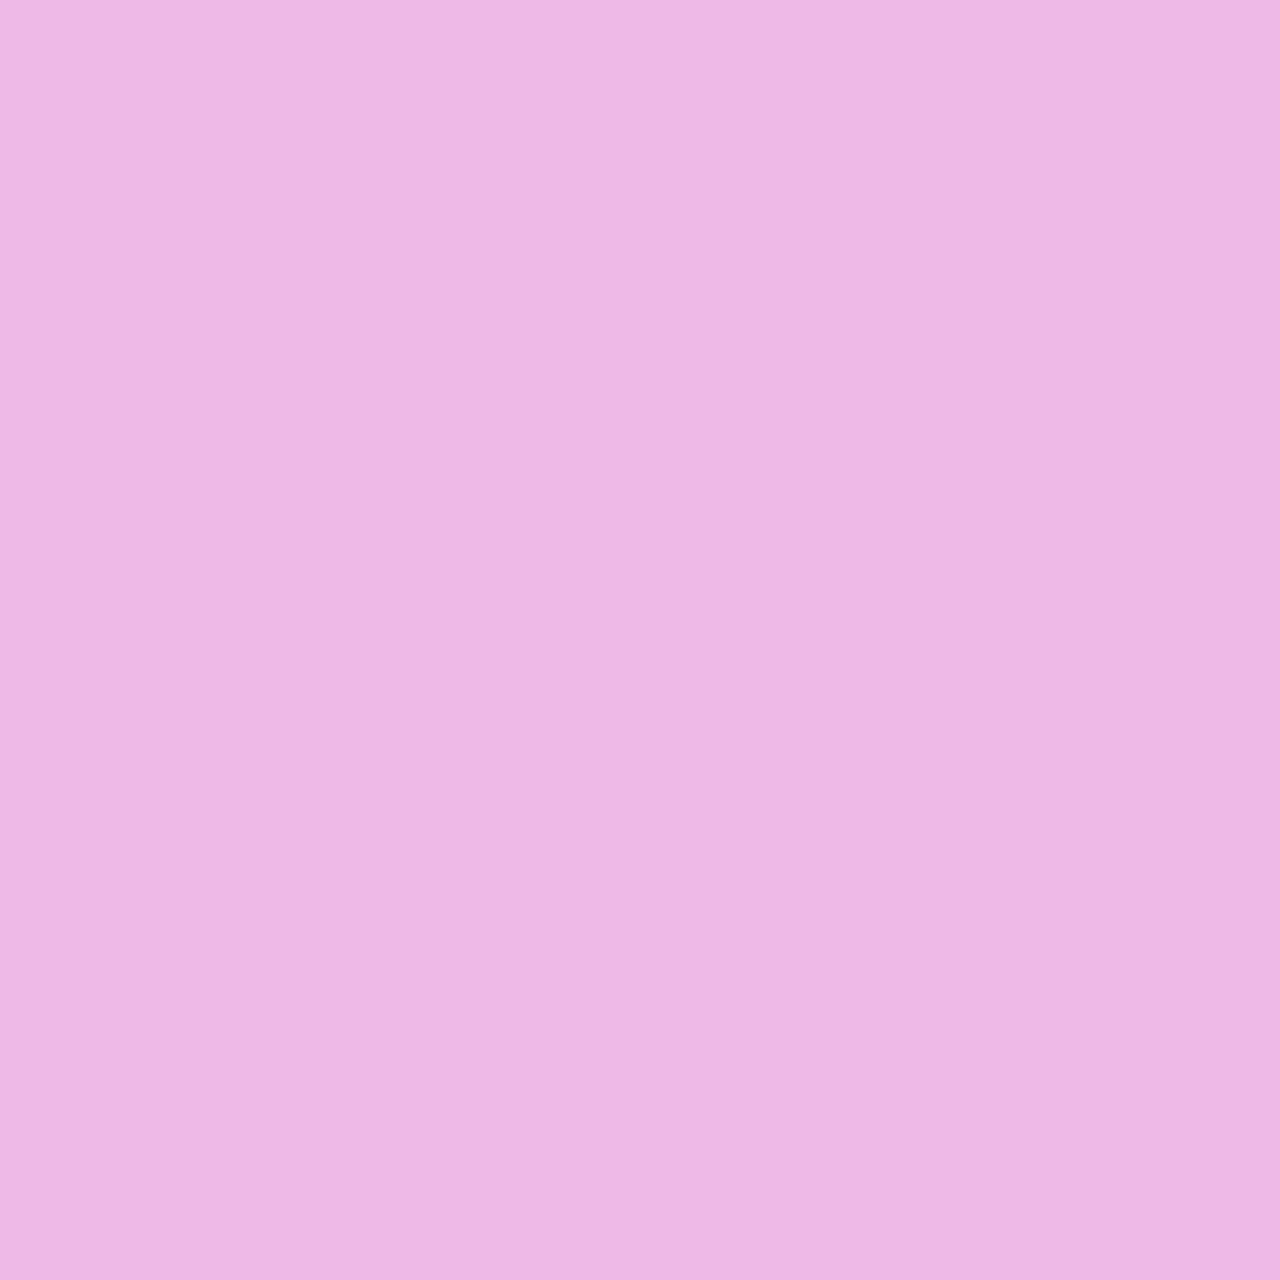 "#0336 Rosco Gels Roscolux Billington Pink, 20x24"""